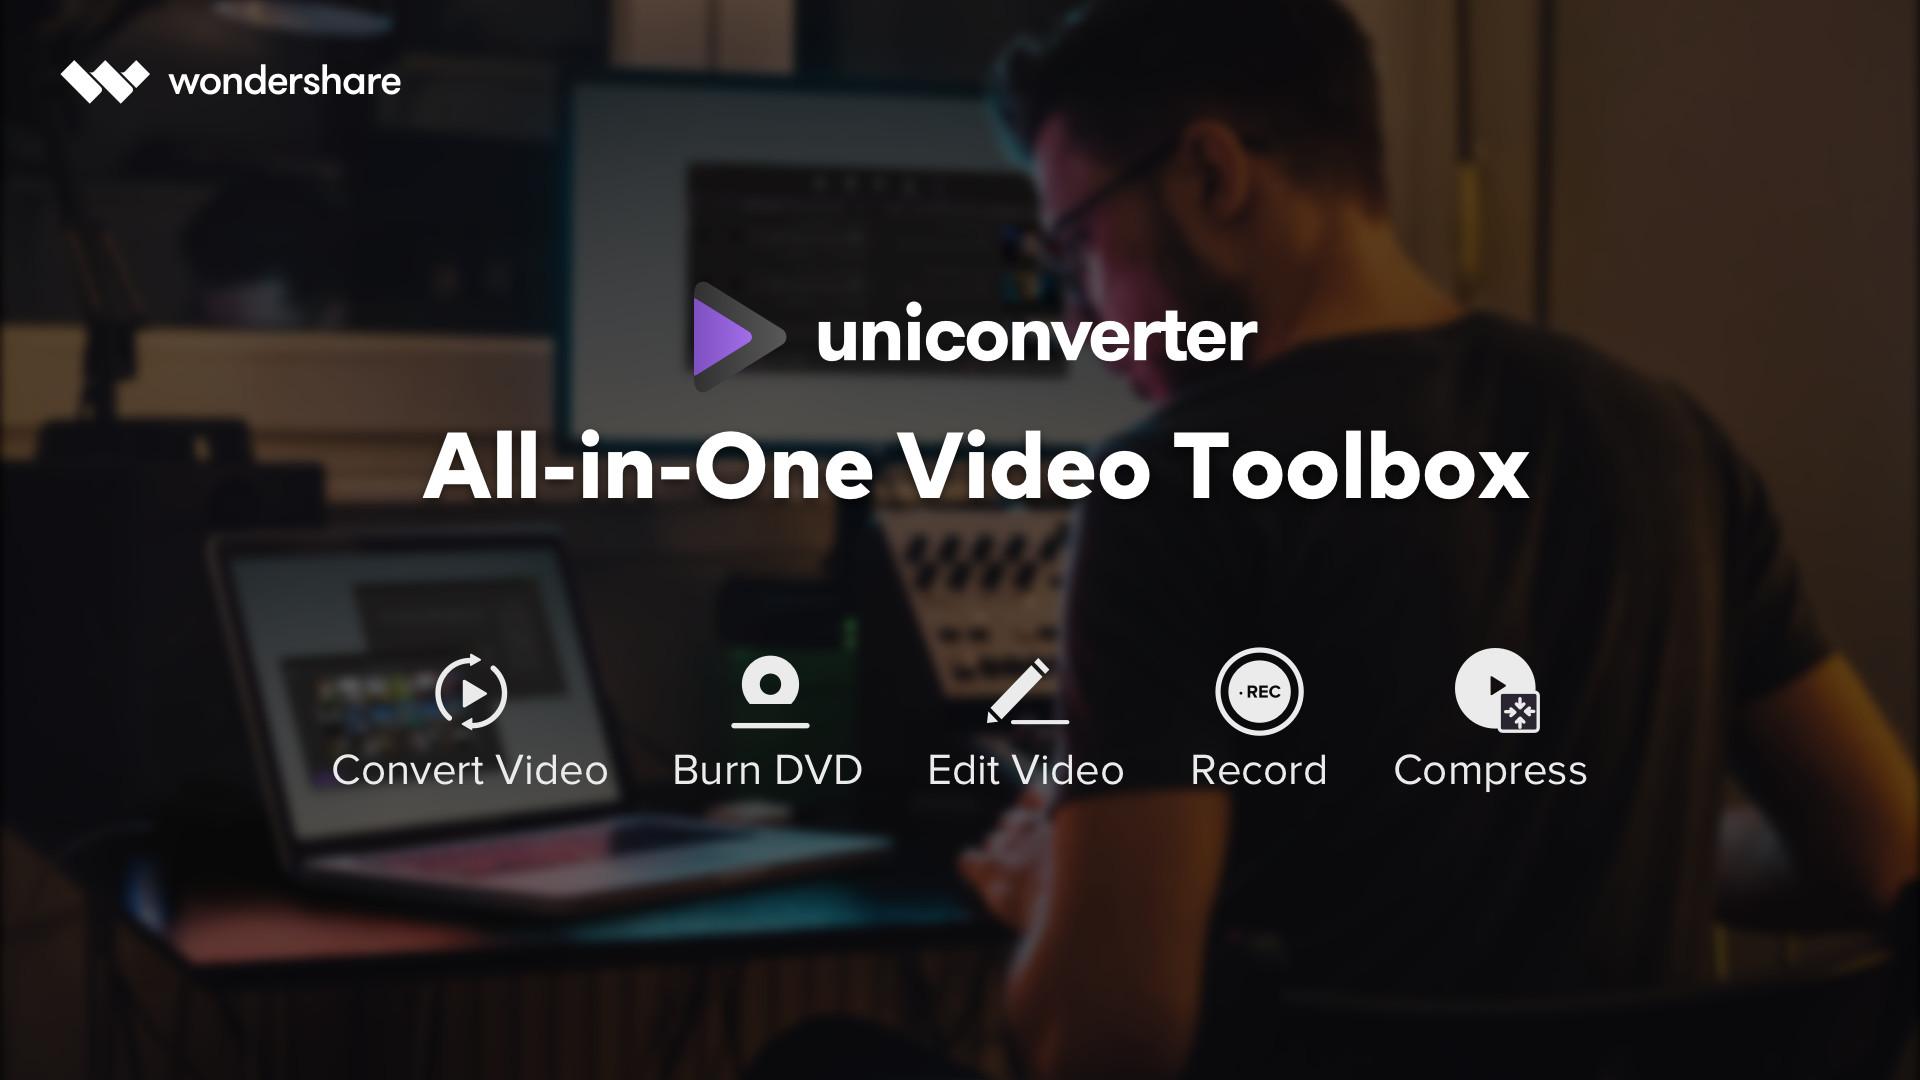 Wondershare Uniconverter-Video Converter, Video Editor, Video Compressor,  Video Recorder, DVD Burner